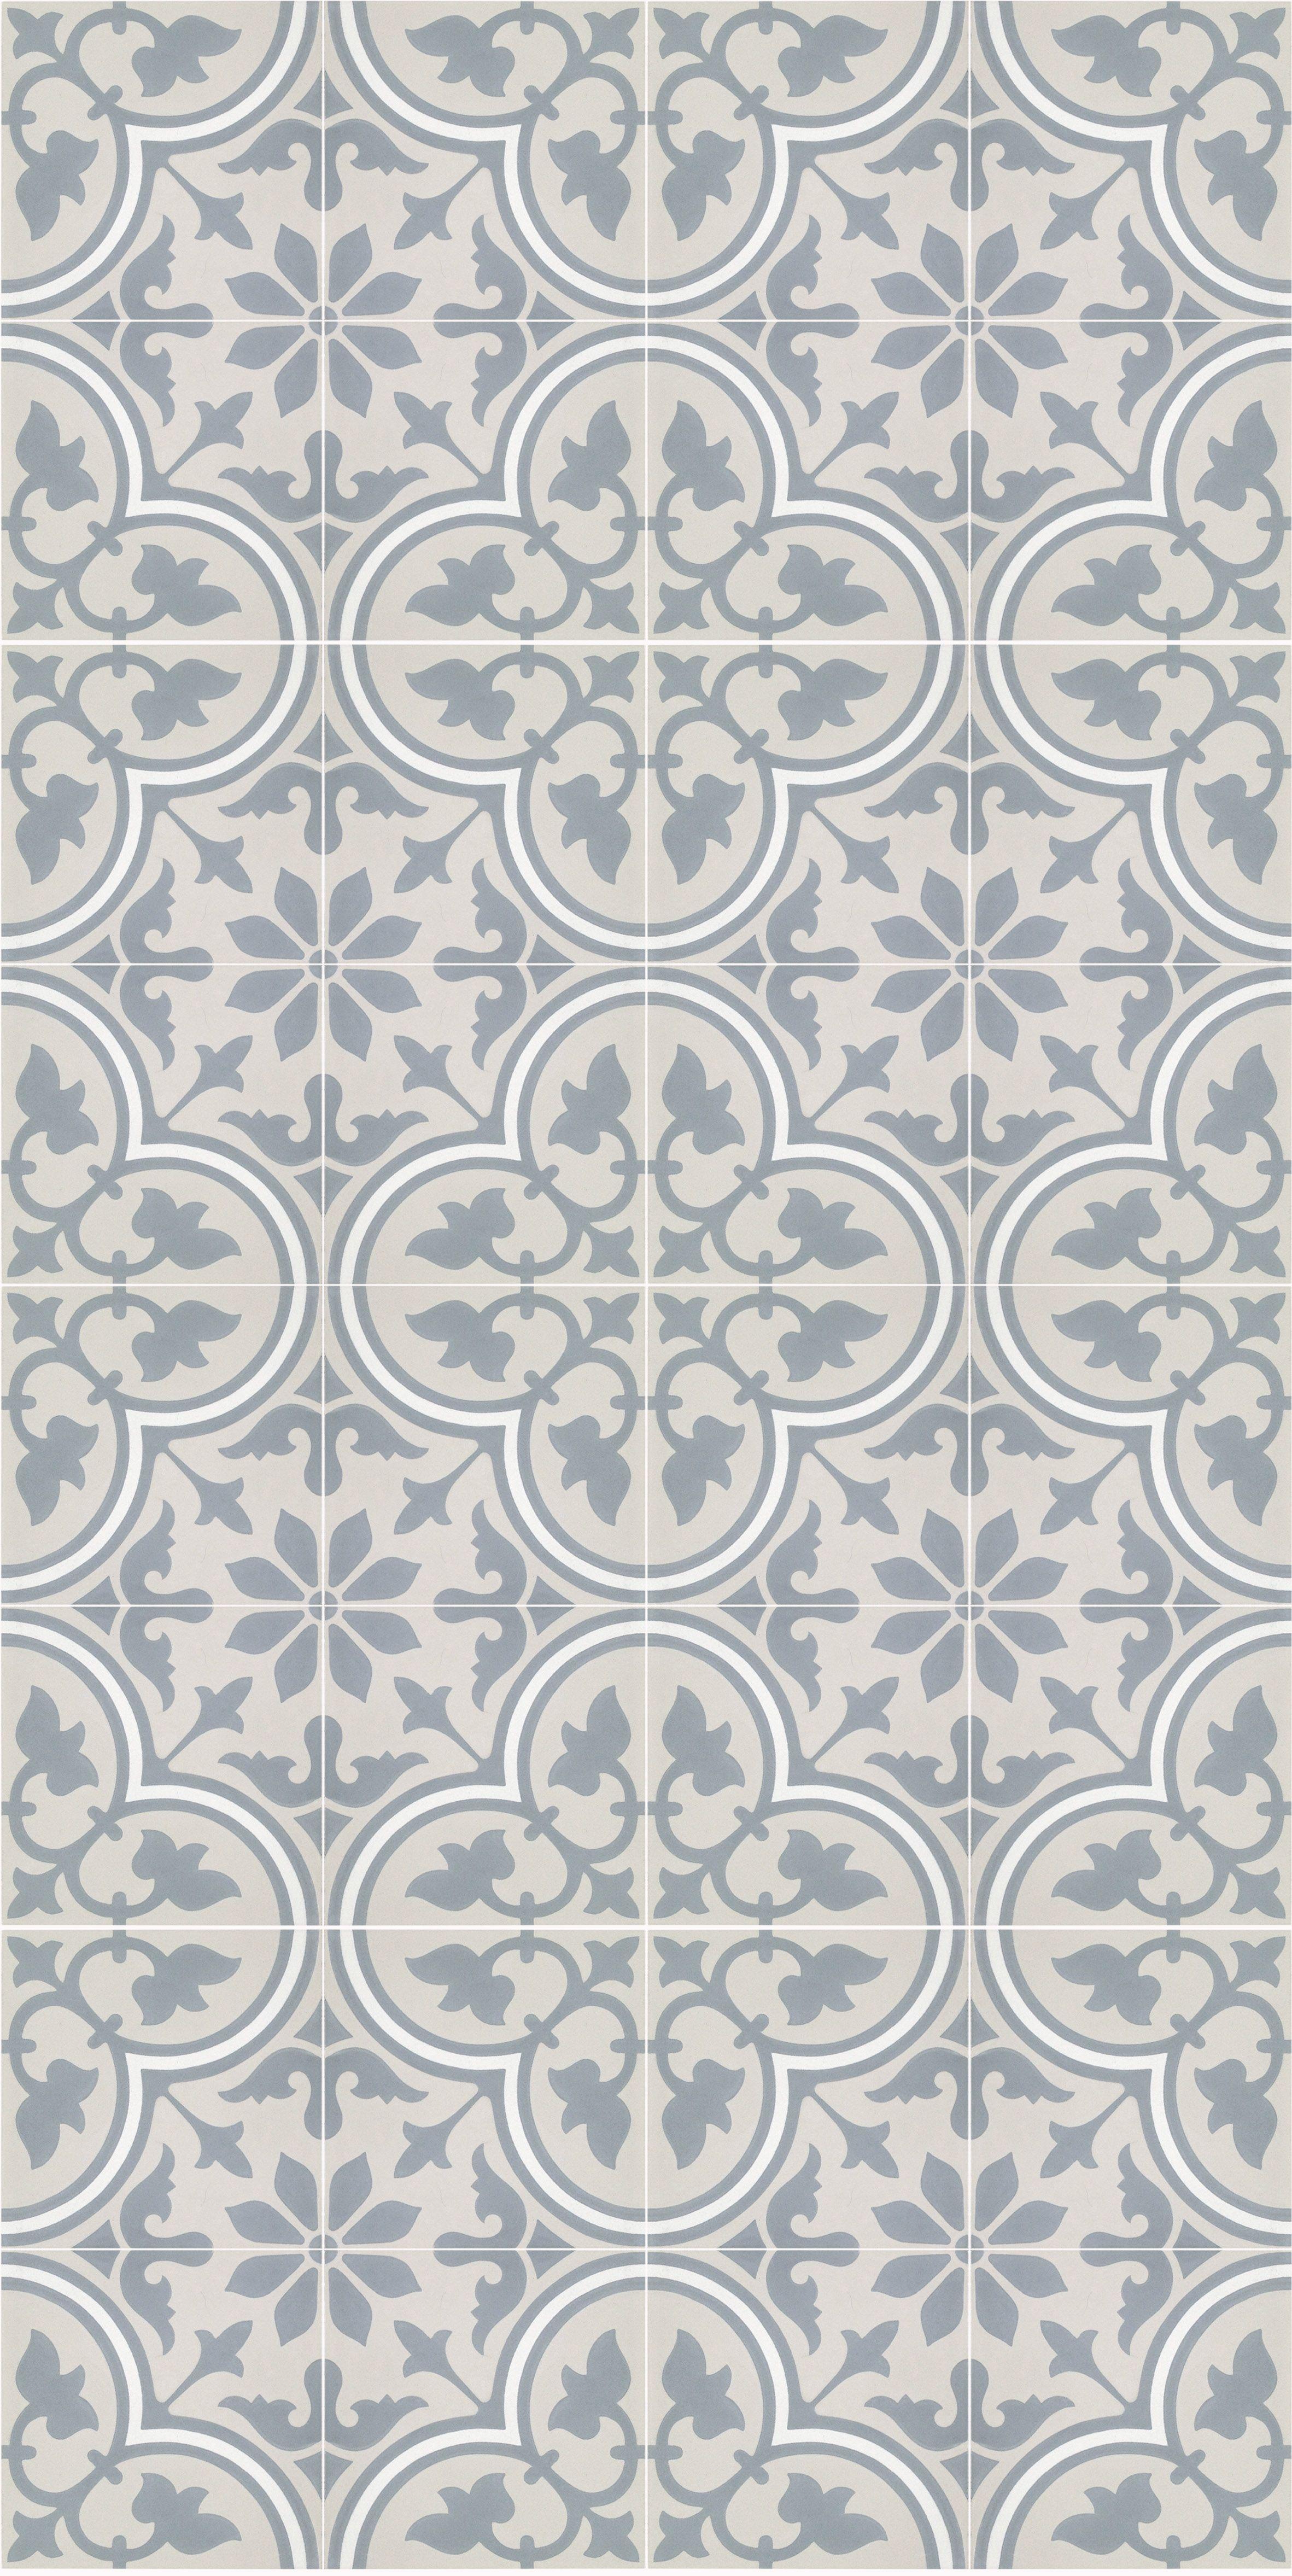 floor and pictures tile of patterned uk great flooring vinyl ideas bathroom vintage